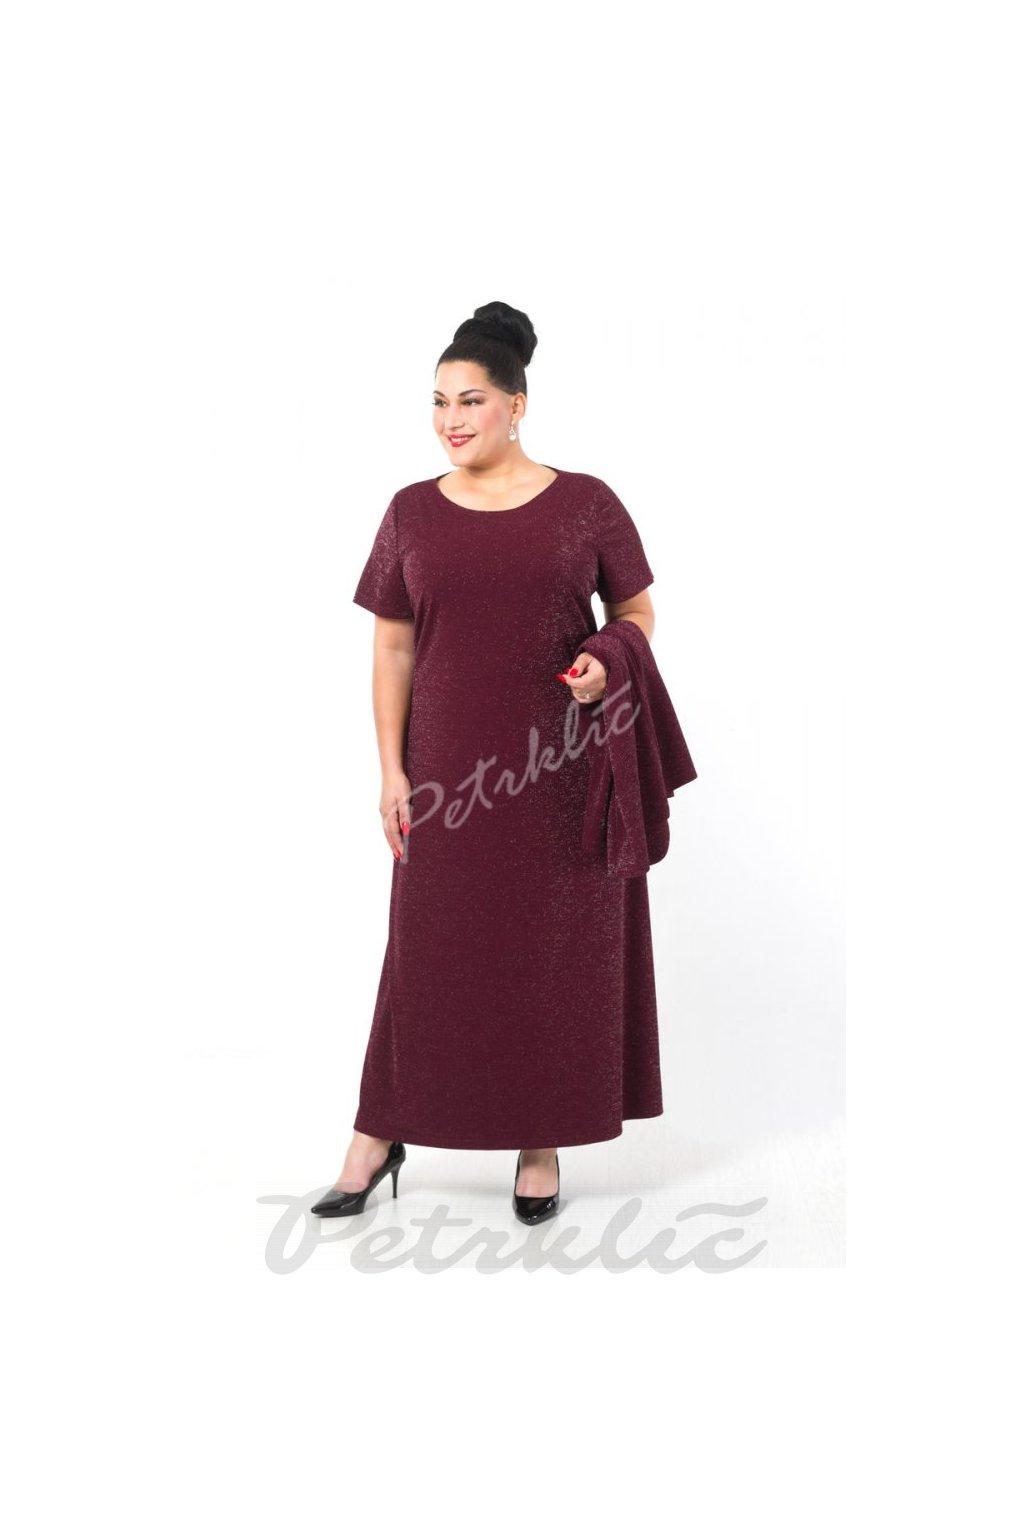 DAKOTA - šaty krátký rukáv 110 - 115 cm